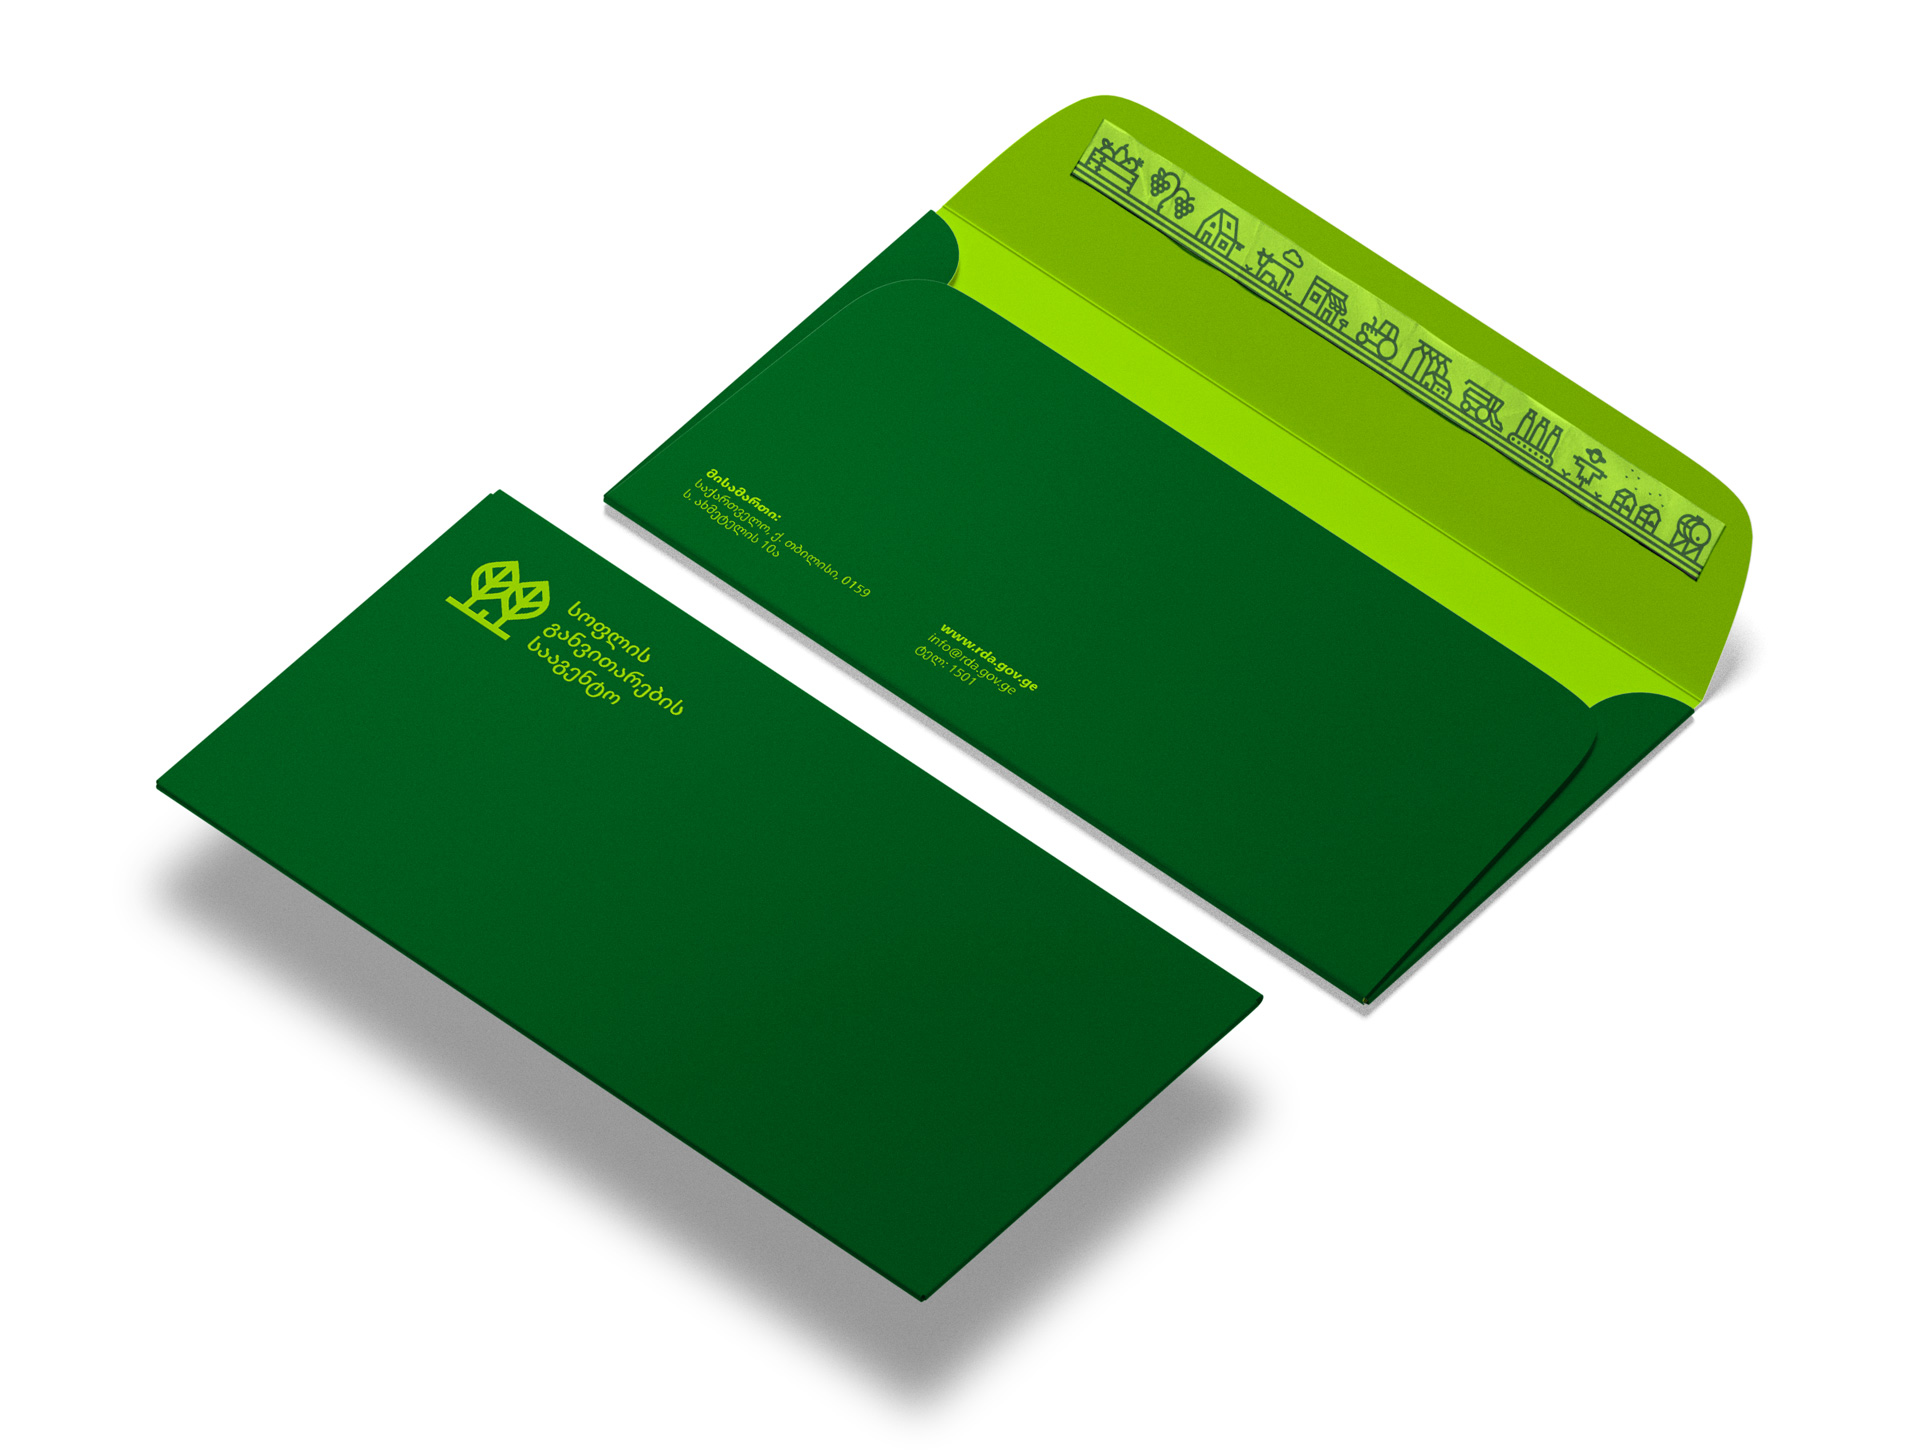 RDA-Green-Envelope-White-Crop-BG-1920-q80-01